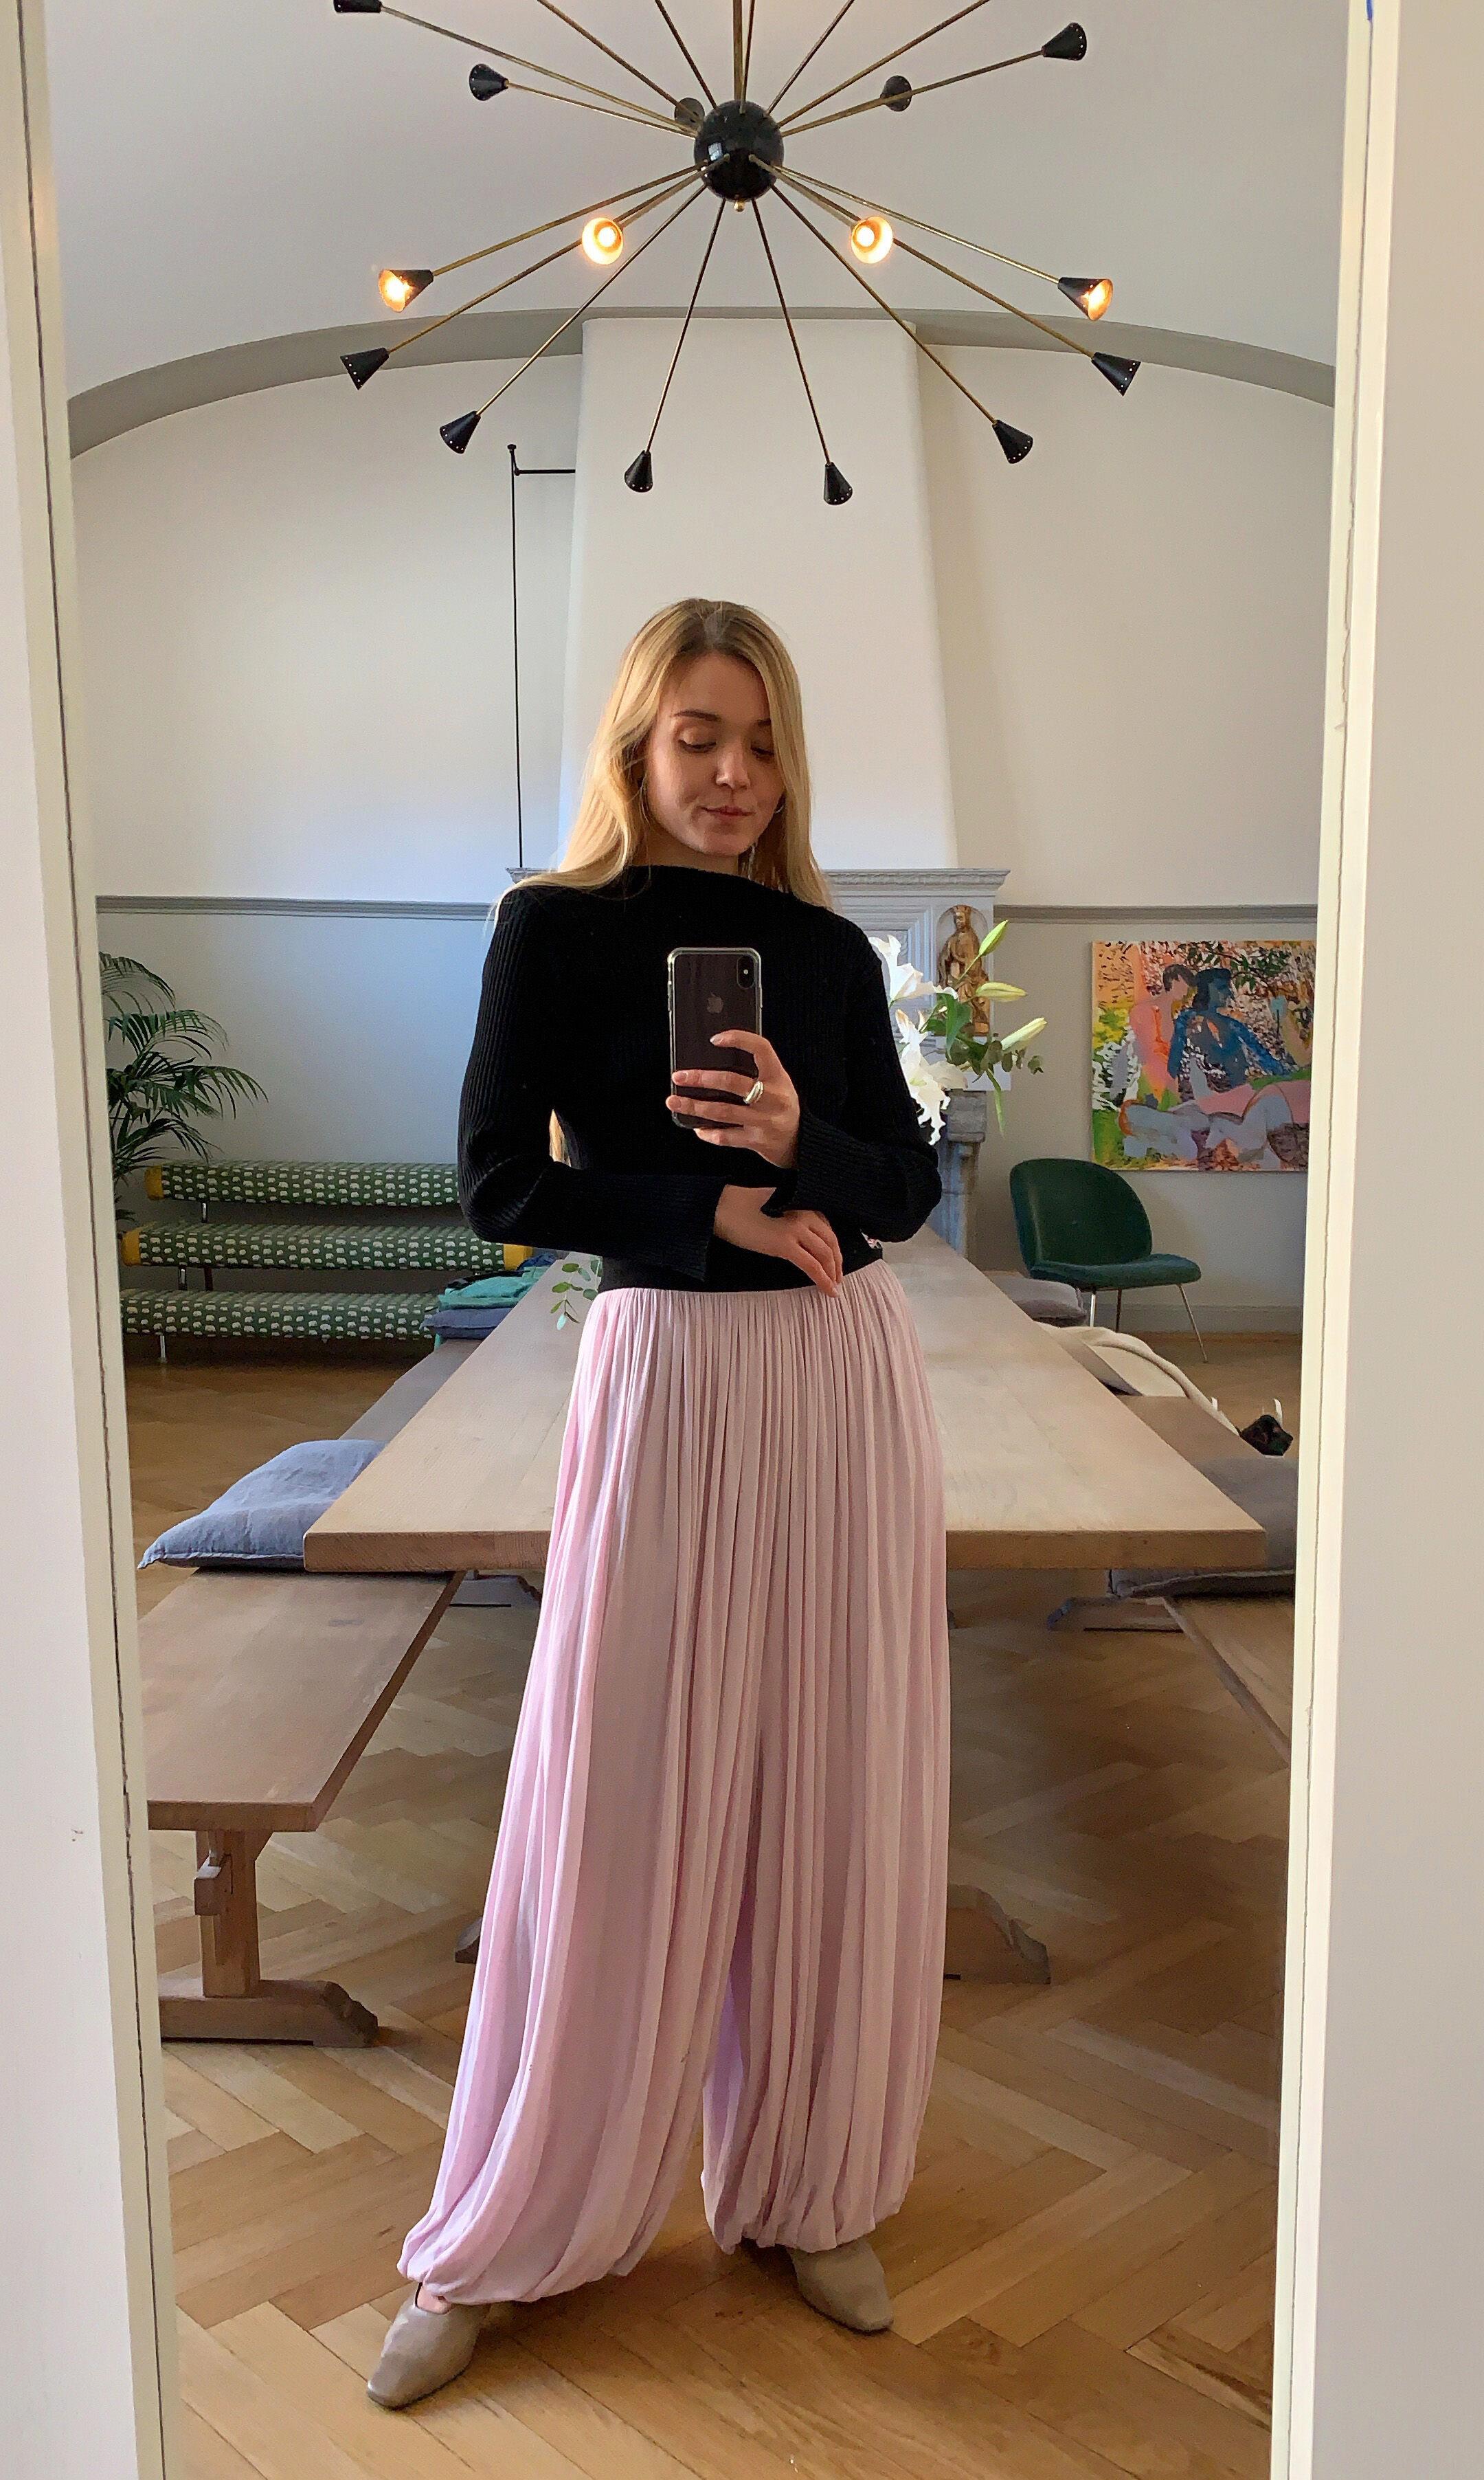 BMB_Mikaela_Hallen